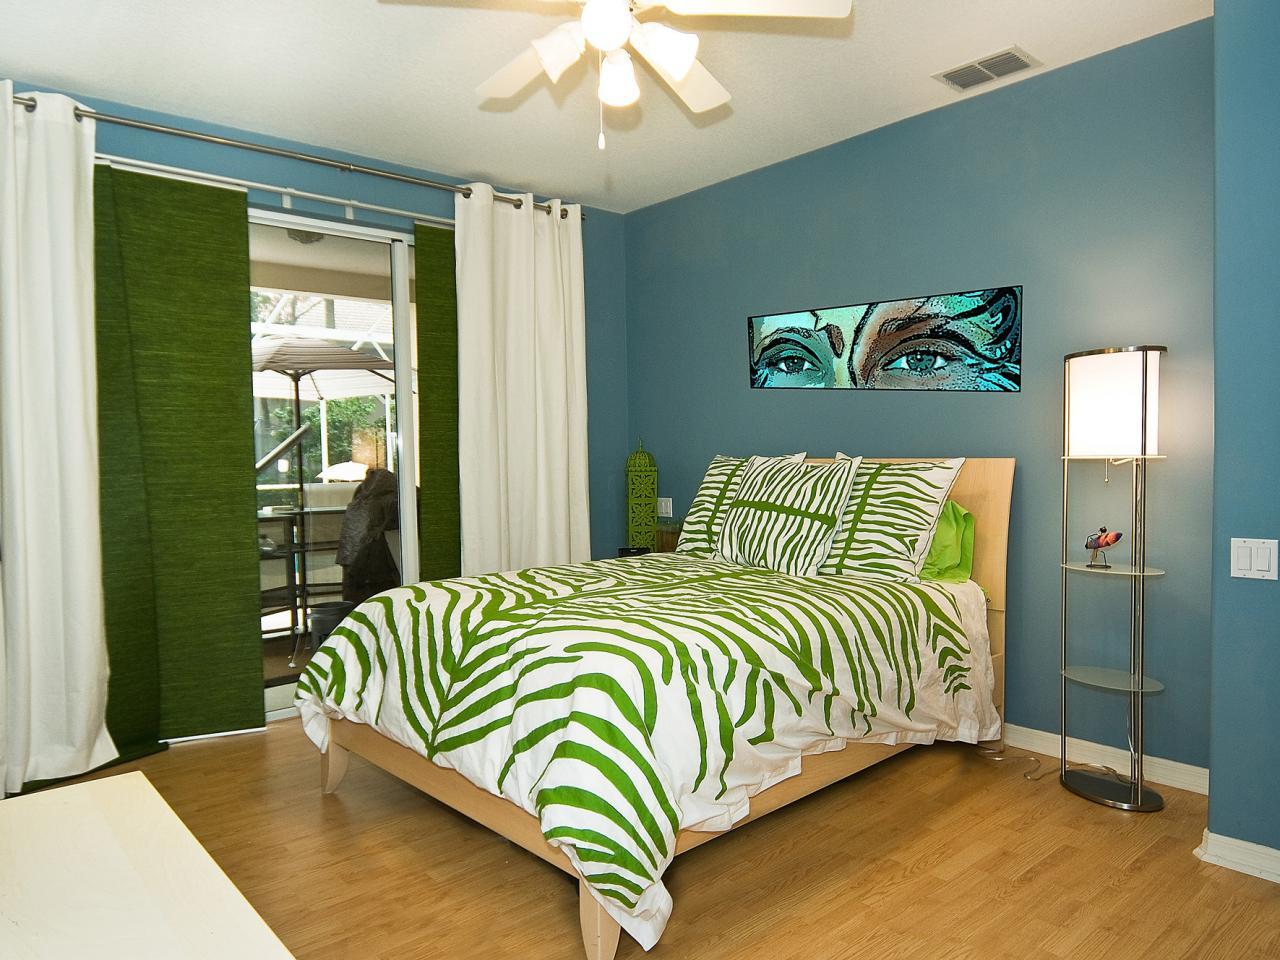 Sassy and Sophisticated Teen and Tween Bedroom Ideas on Teenagers Room Ideas  id=67975